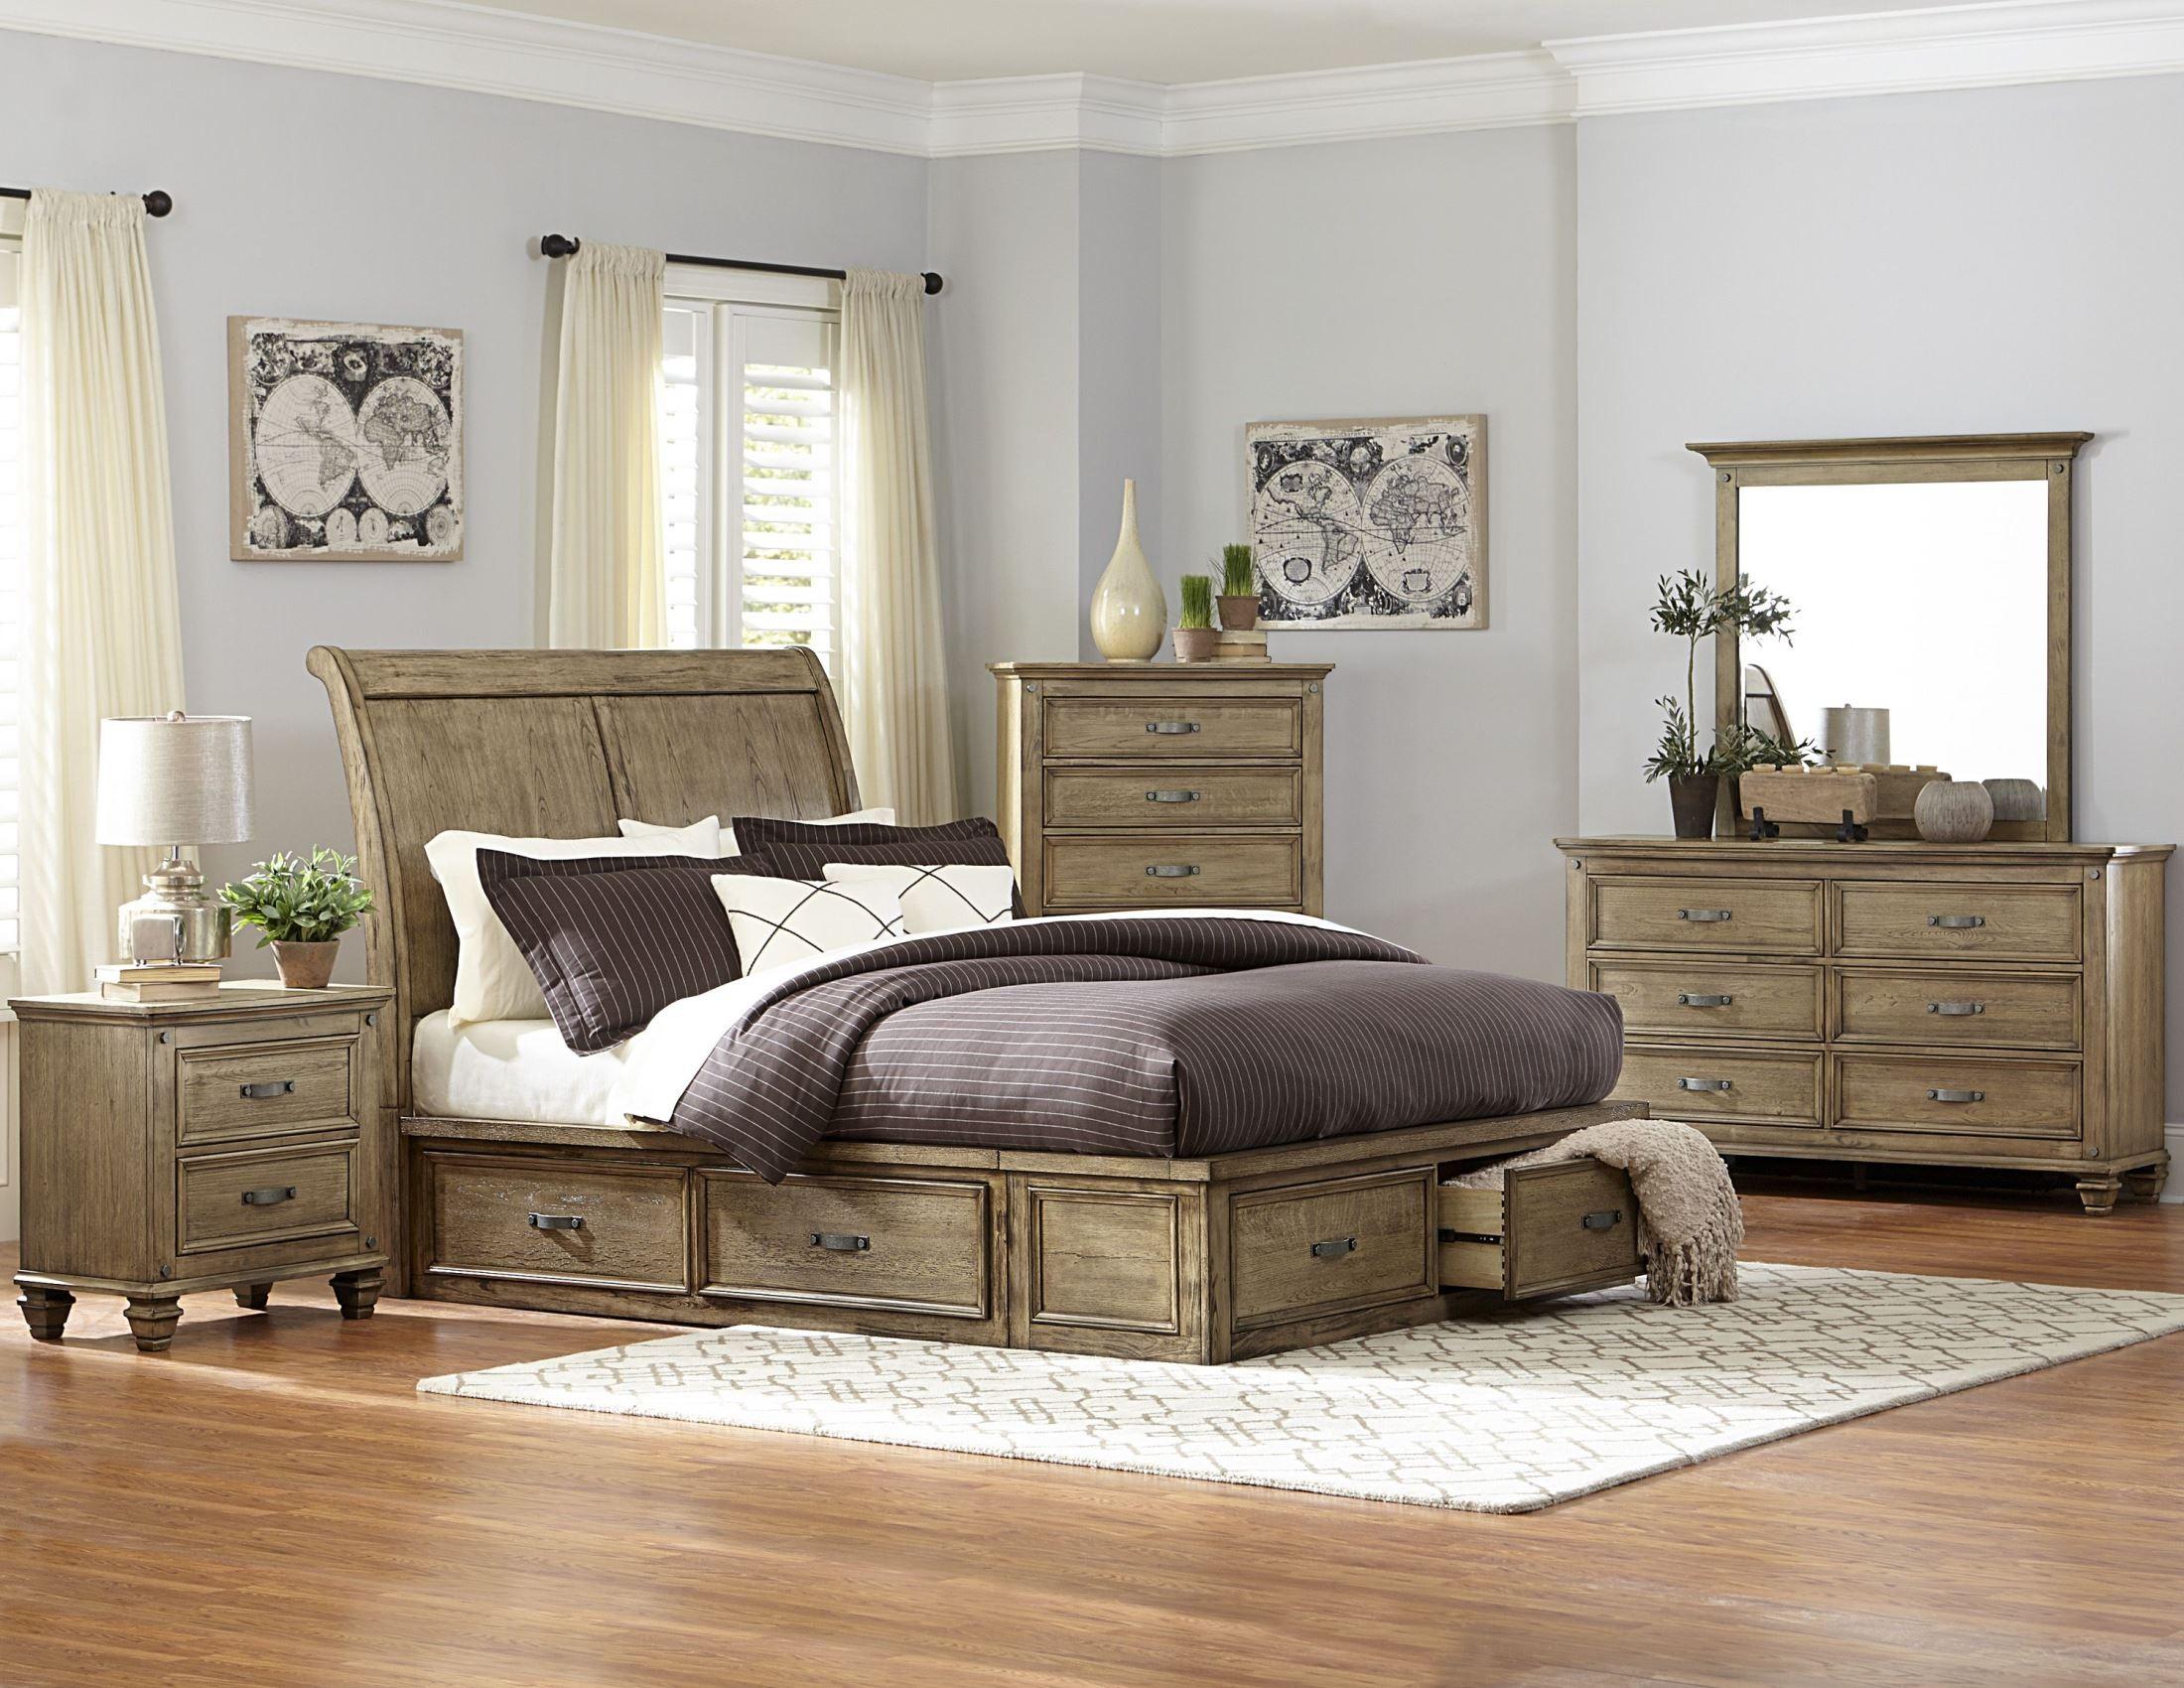 Sylvania Driftwood King Platform Storage Bed From